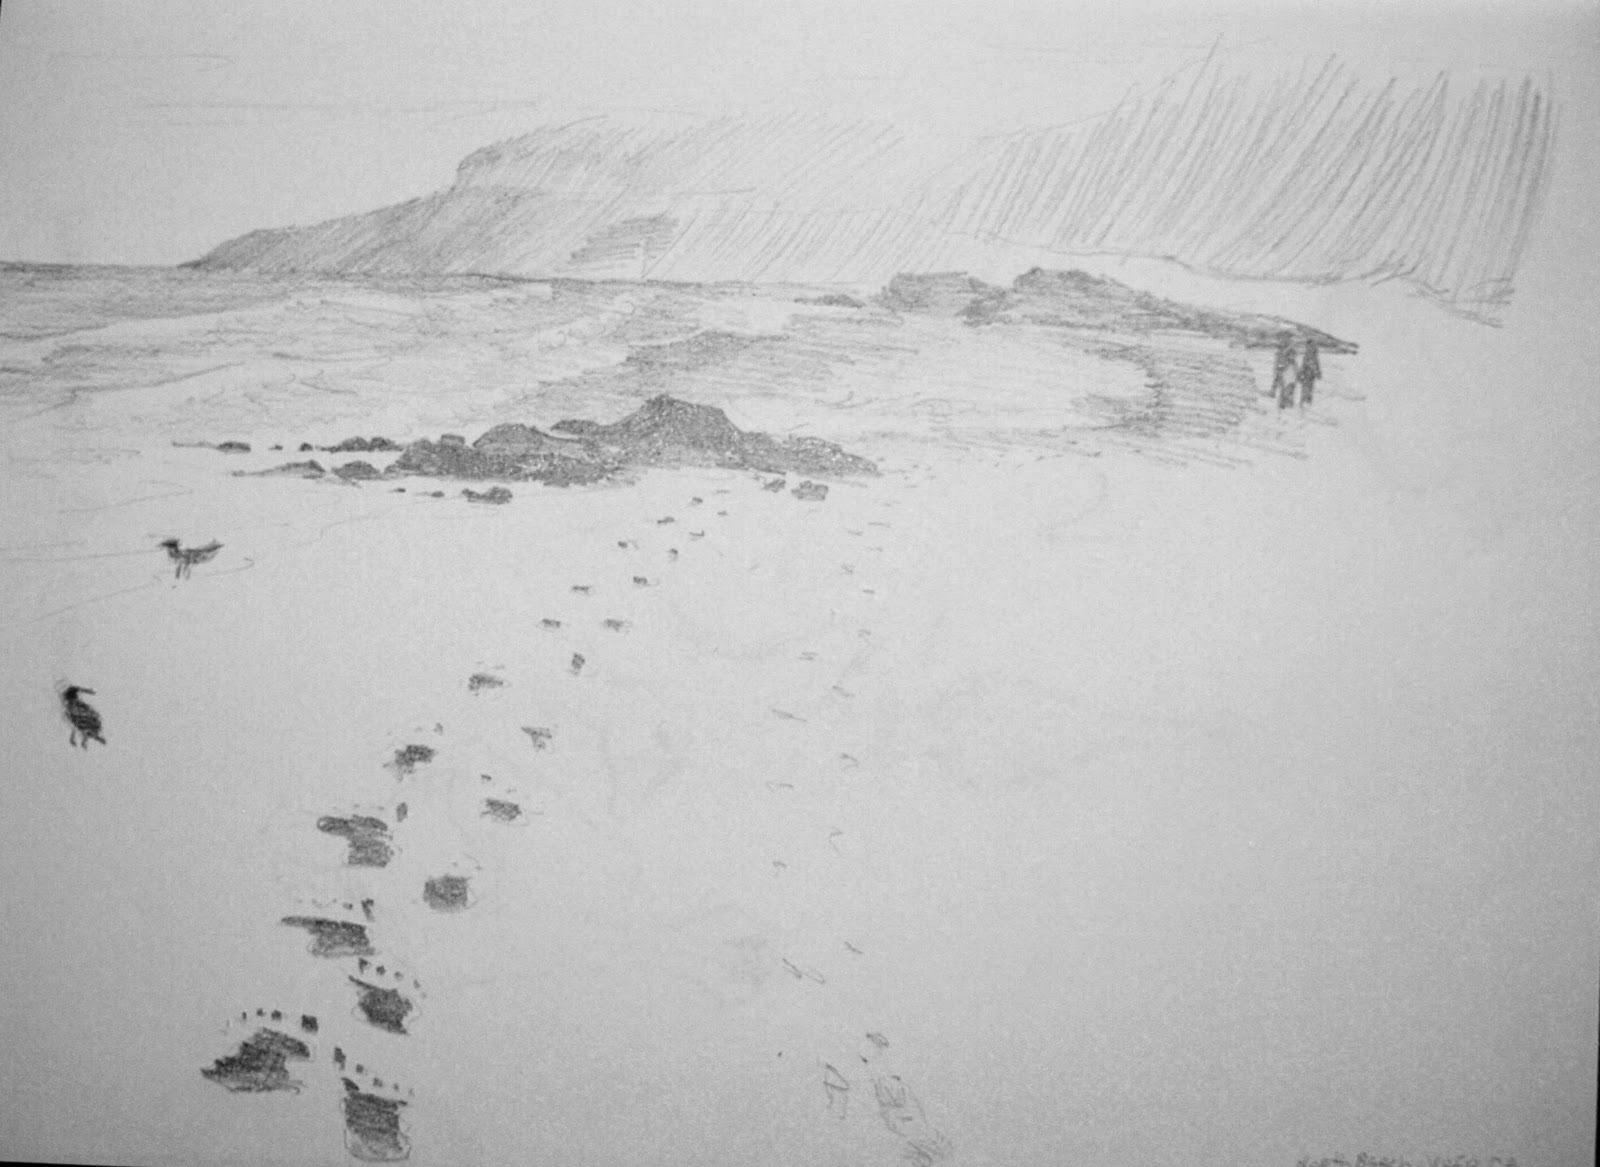 ARTIQUERYROSE: PENCIL SKETCH: LONELY BEACH